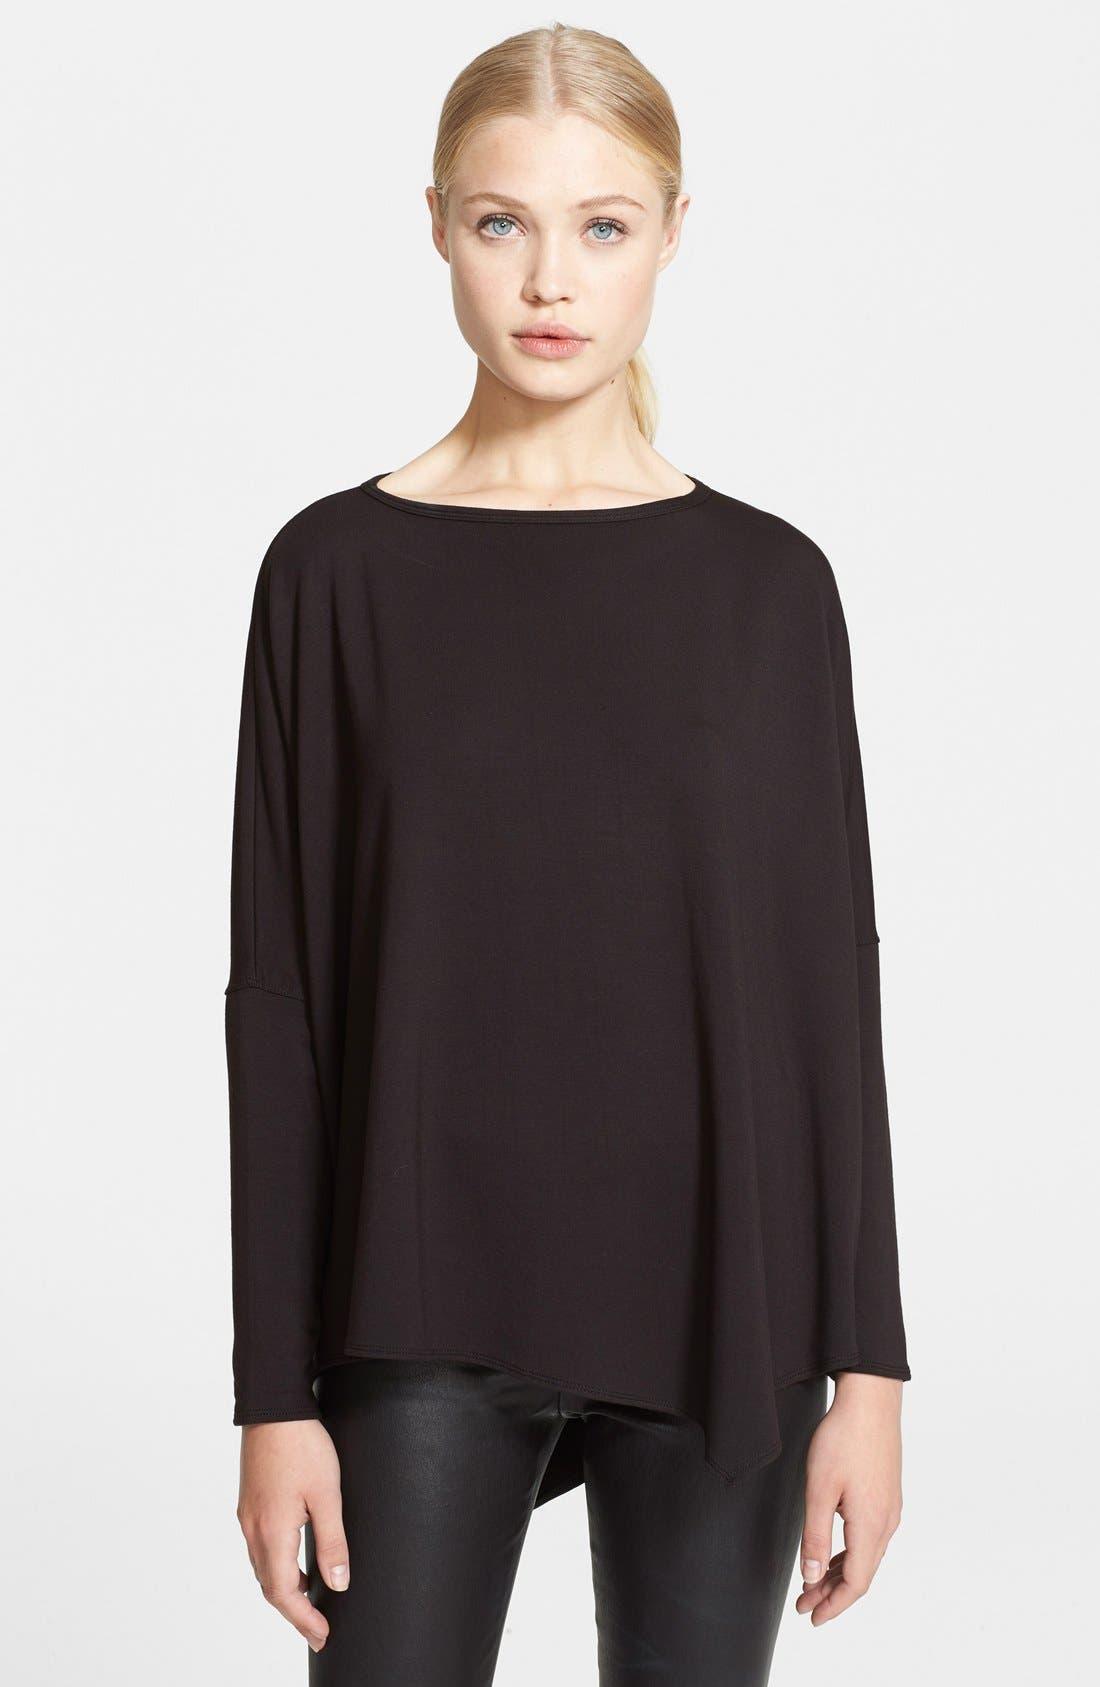 Alternate Image 1 Selected - Helmut Lang 'Villous' Oversized Pullover